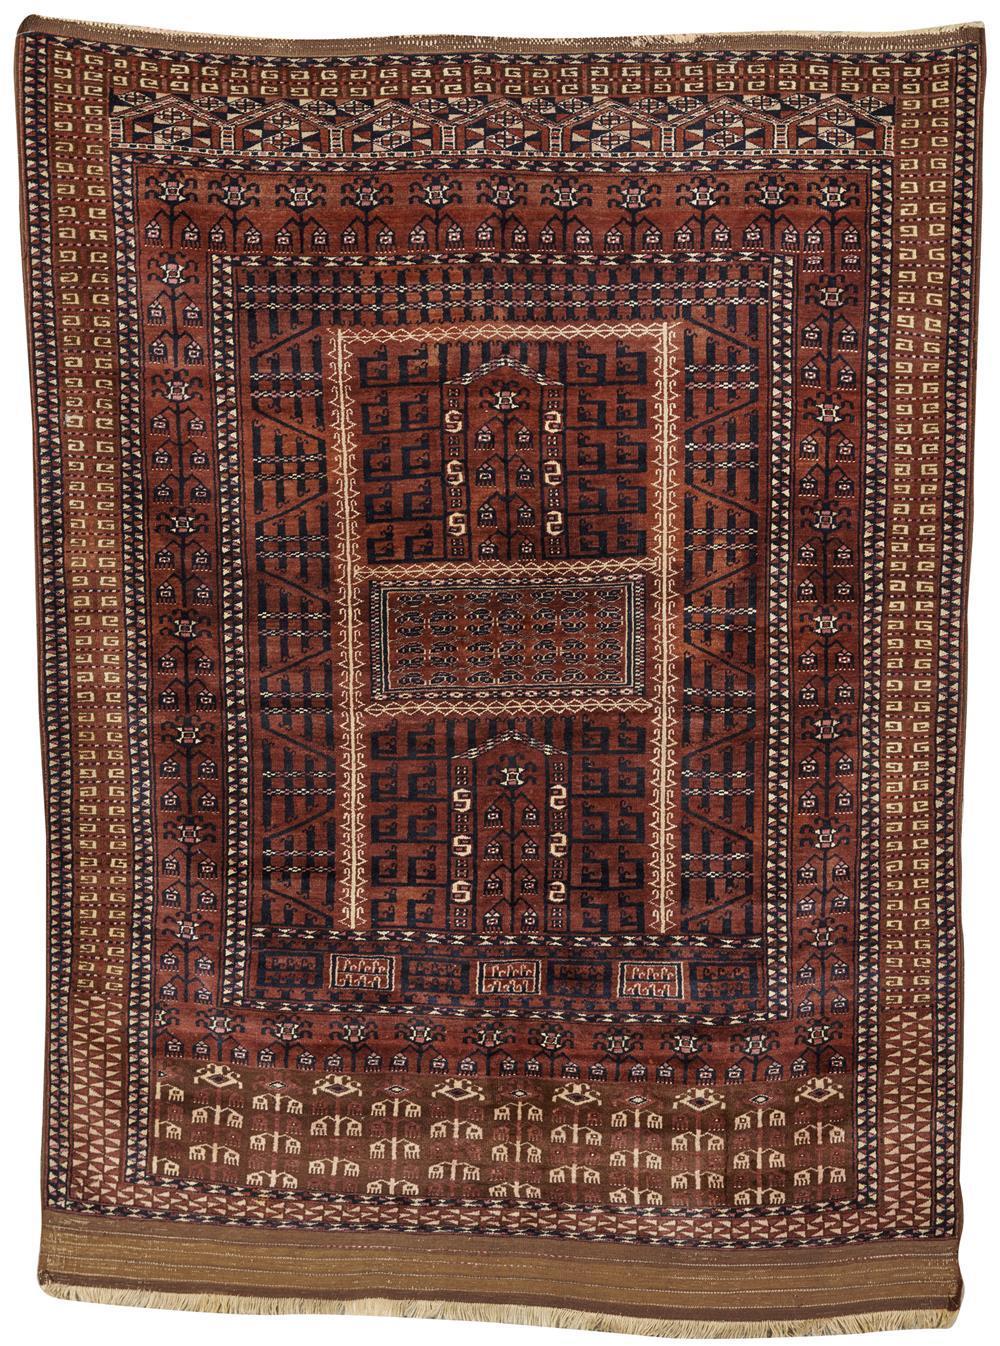 Saryk Ensi, Turkestan, ca. 1900; 6 ft. 1 in. x 4 ft. 6 in.